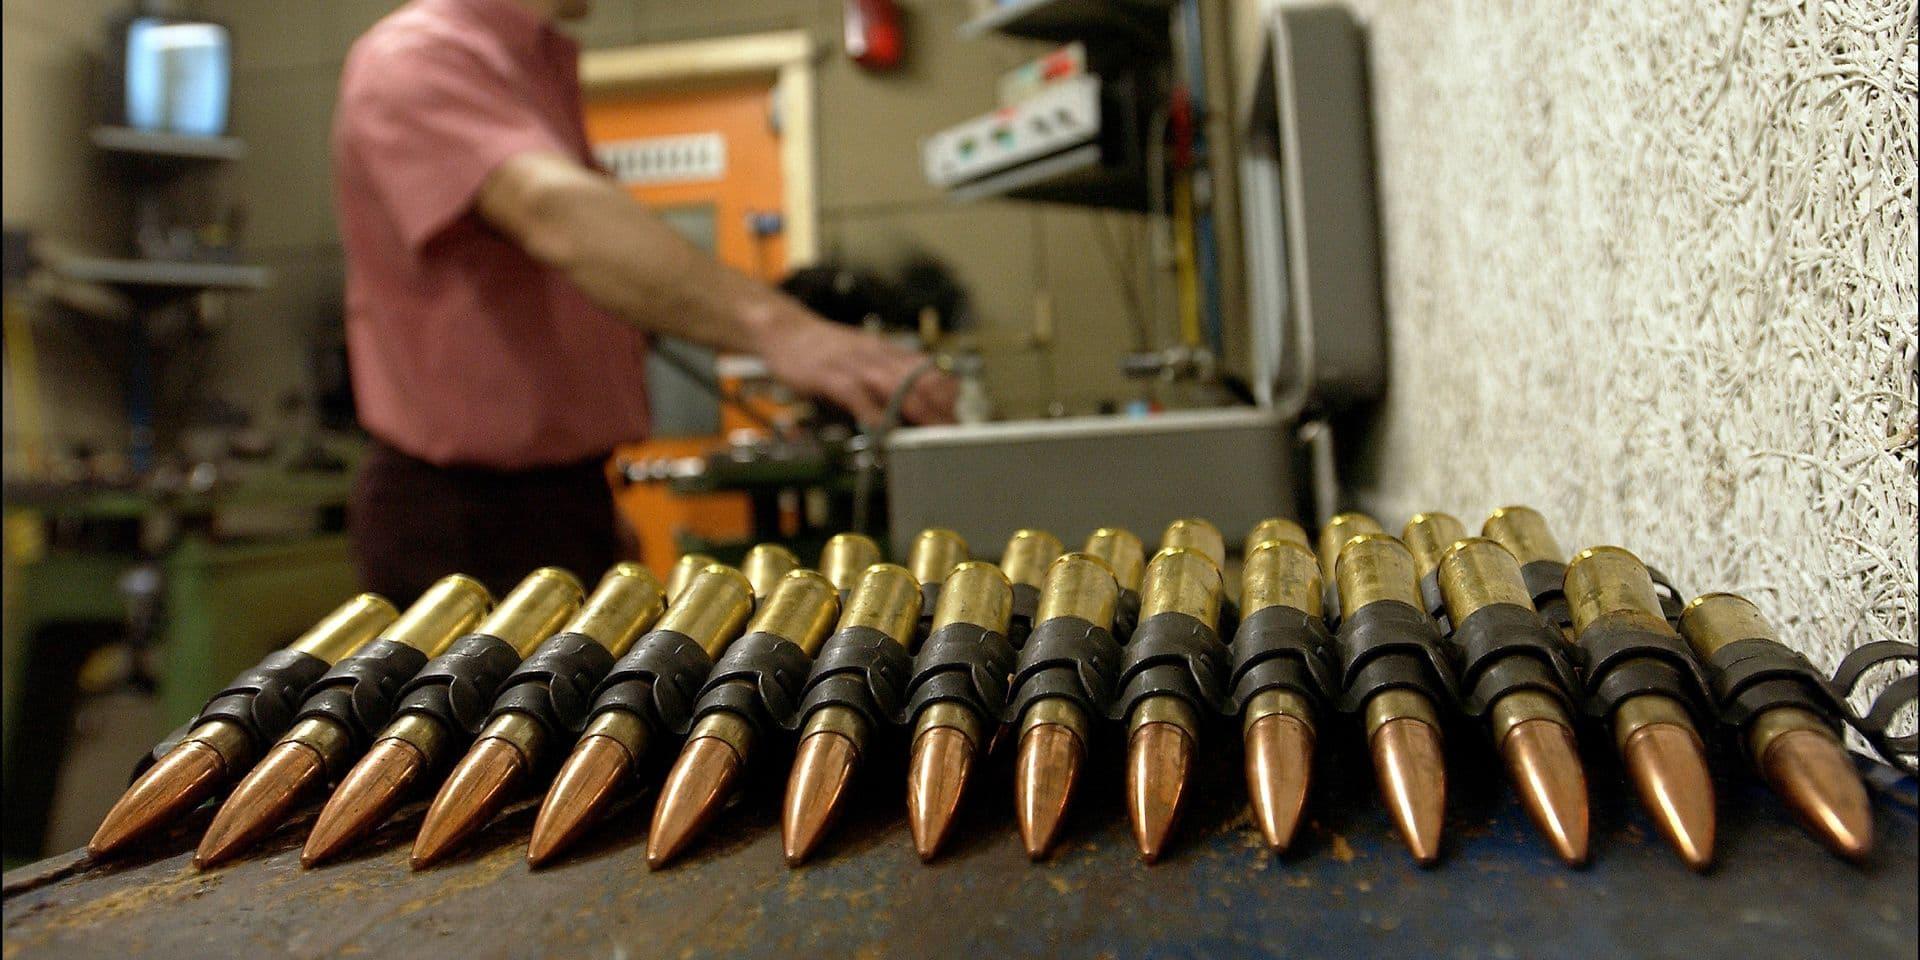 weapons fabrication - gun